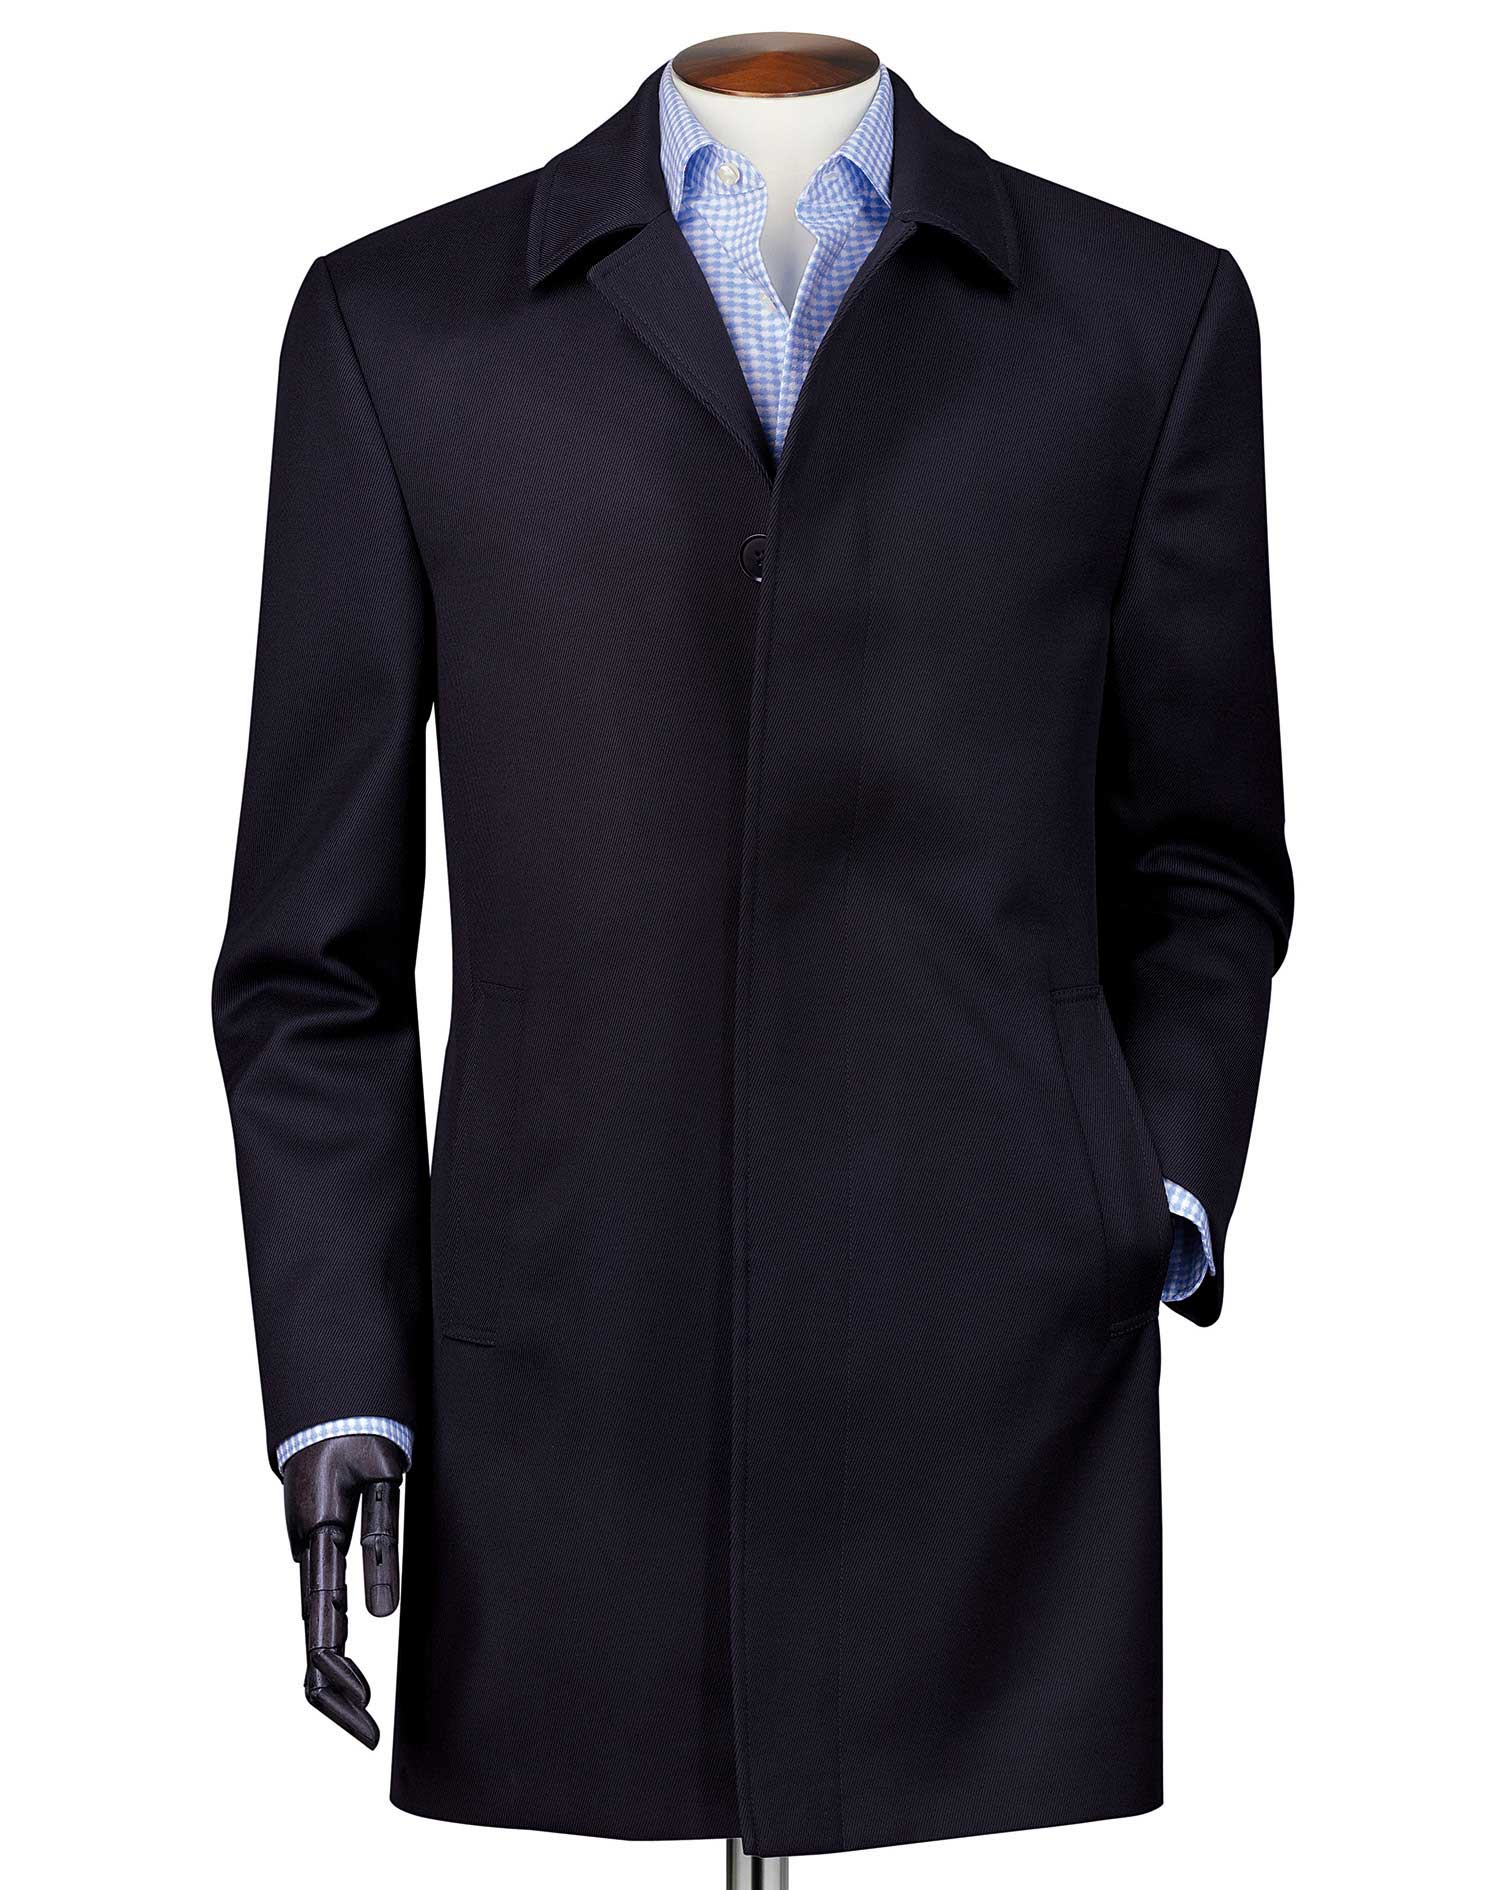 Navy Twill Weatherproof Wool Car Coat Size 44 Regular by Charles Tyrwhitt